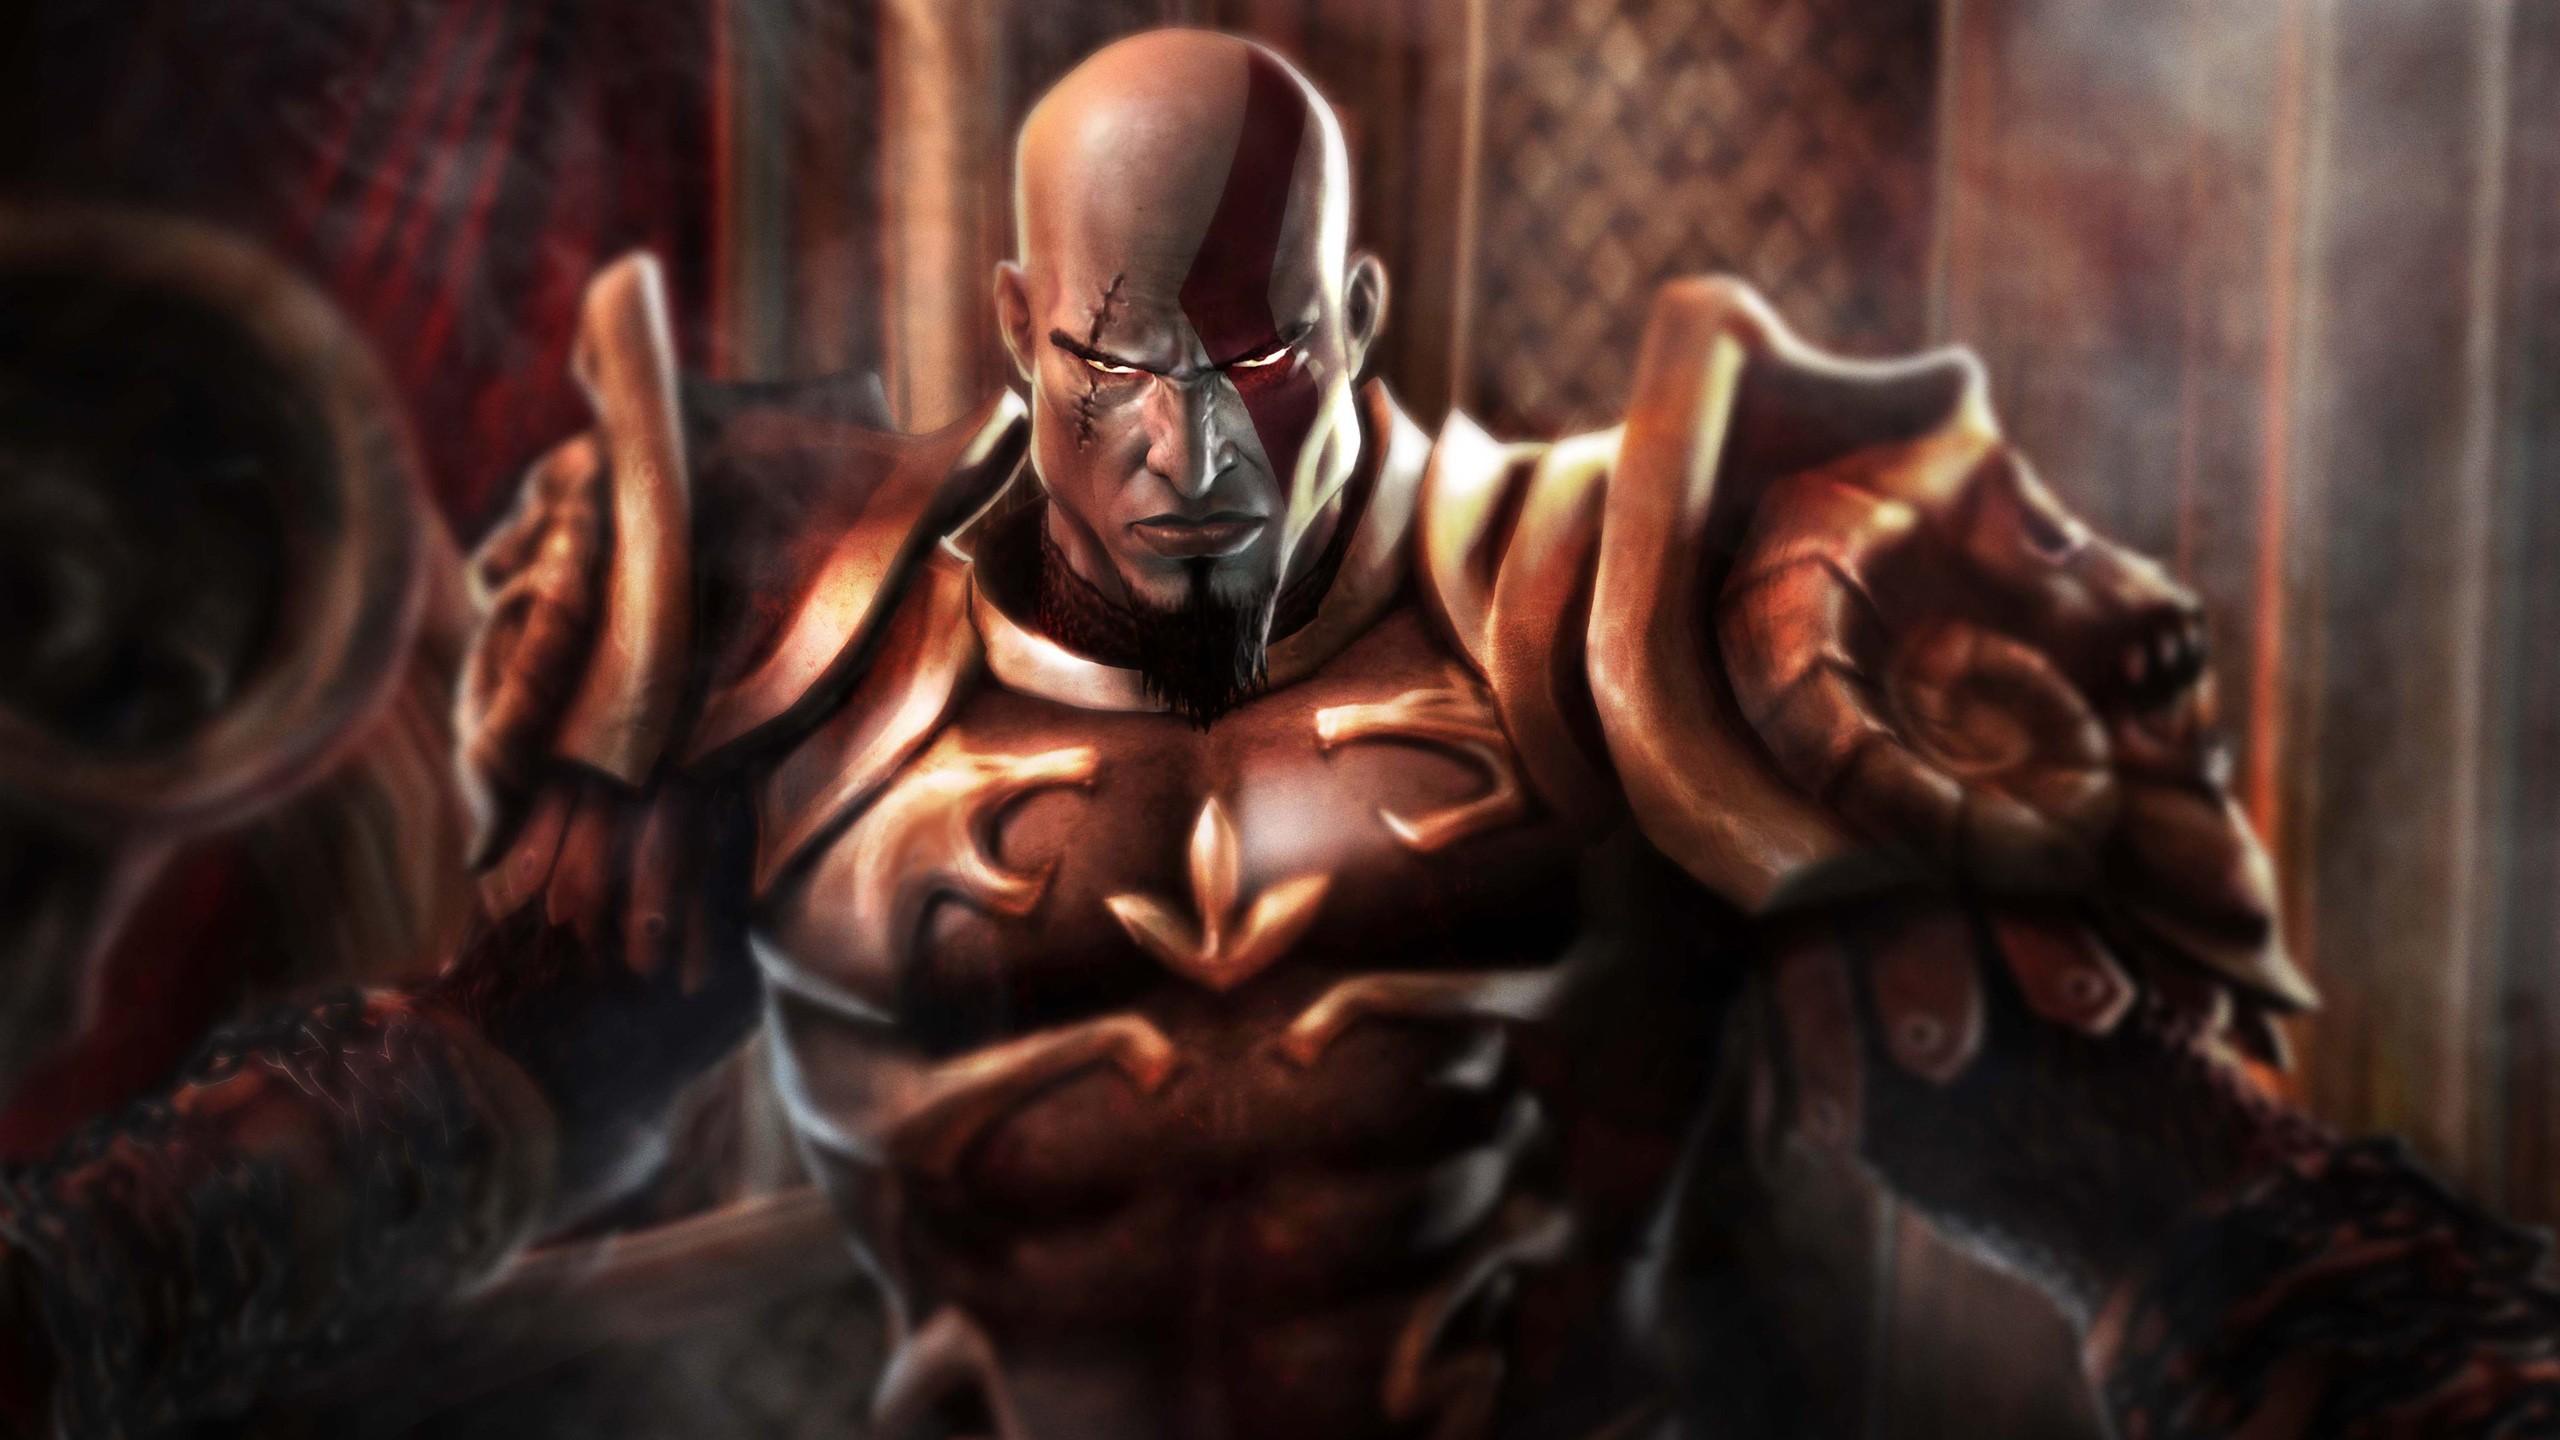 God Of War 4 Wallpaper Iphone X Kratos God Of War Wallpapers Hd Wallpapers Id 8930